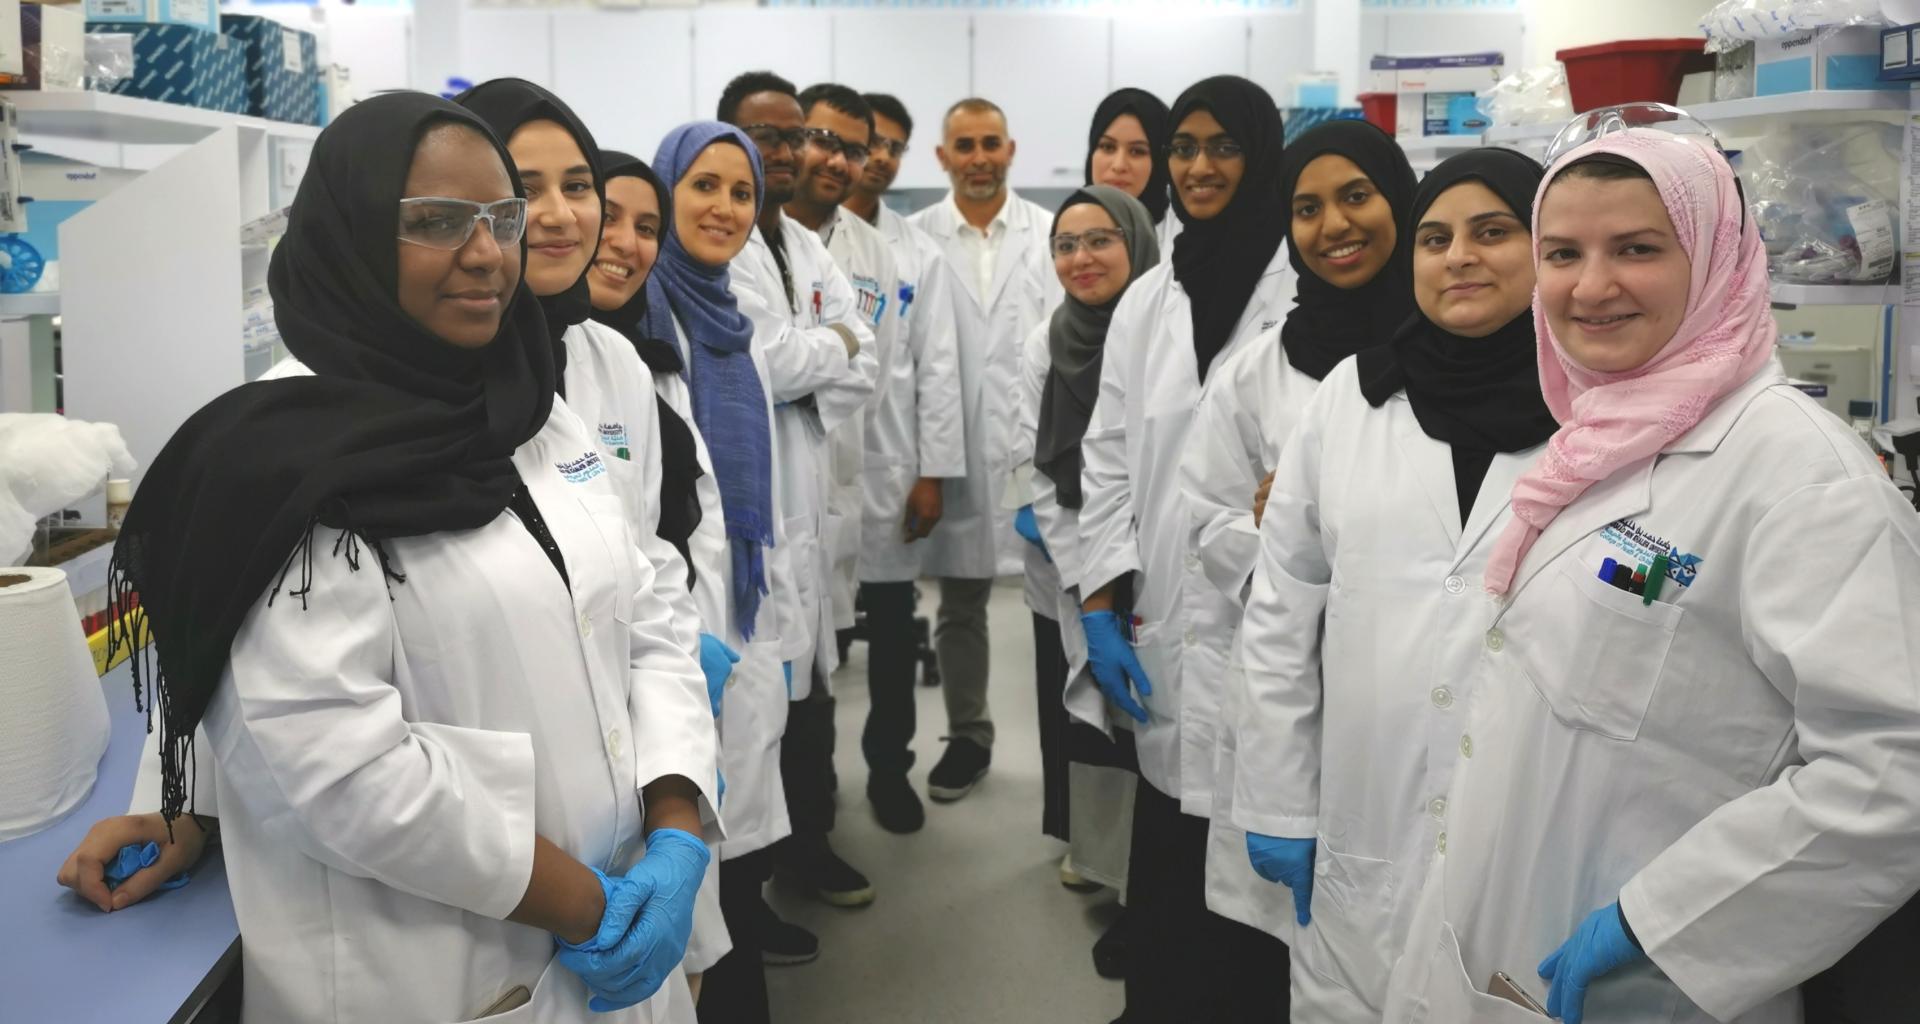 HBKU's CHLS Workshop Advances Laboratory Skills of Graduate Students